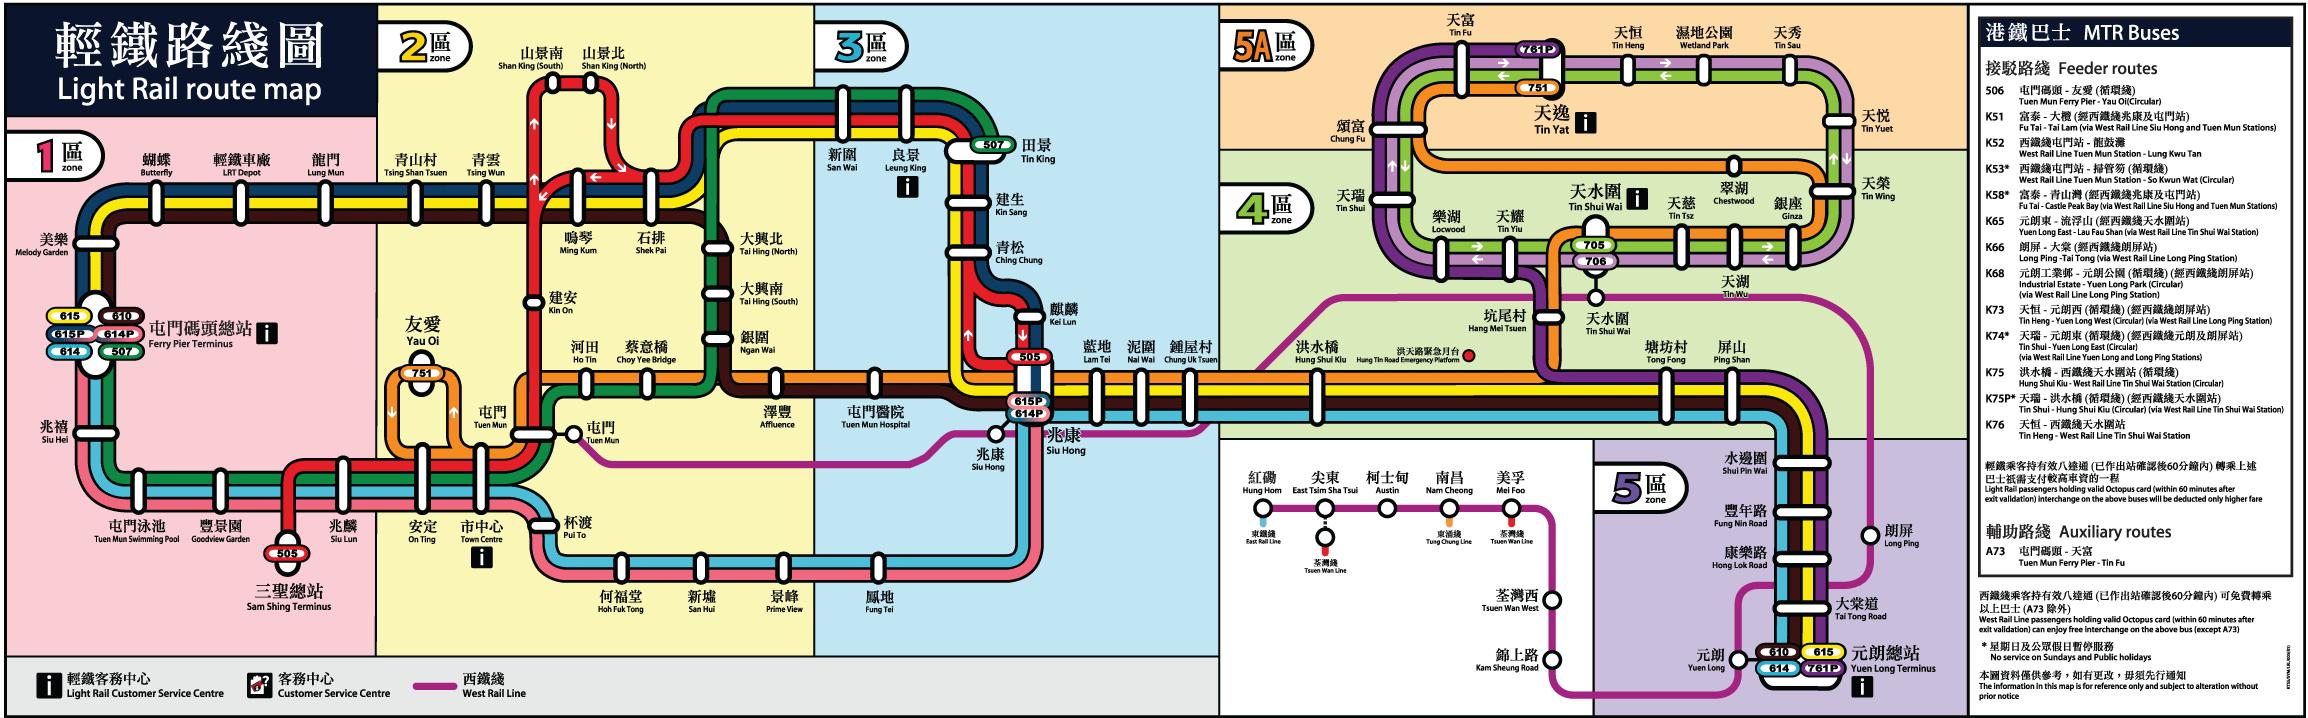 Metro Map Hk.Hong Kong Tram Map Light Metro Mapsof Net